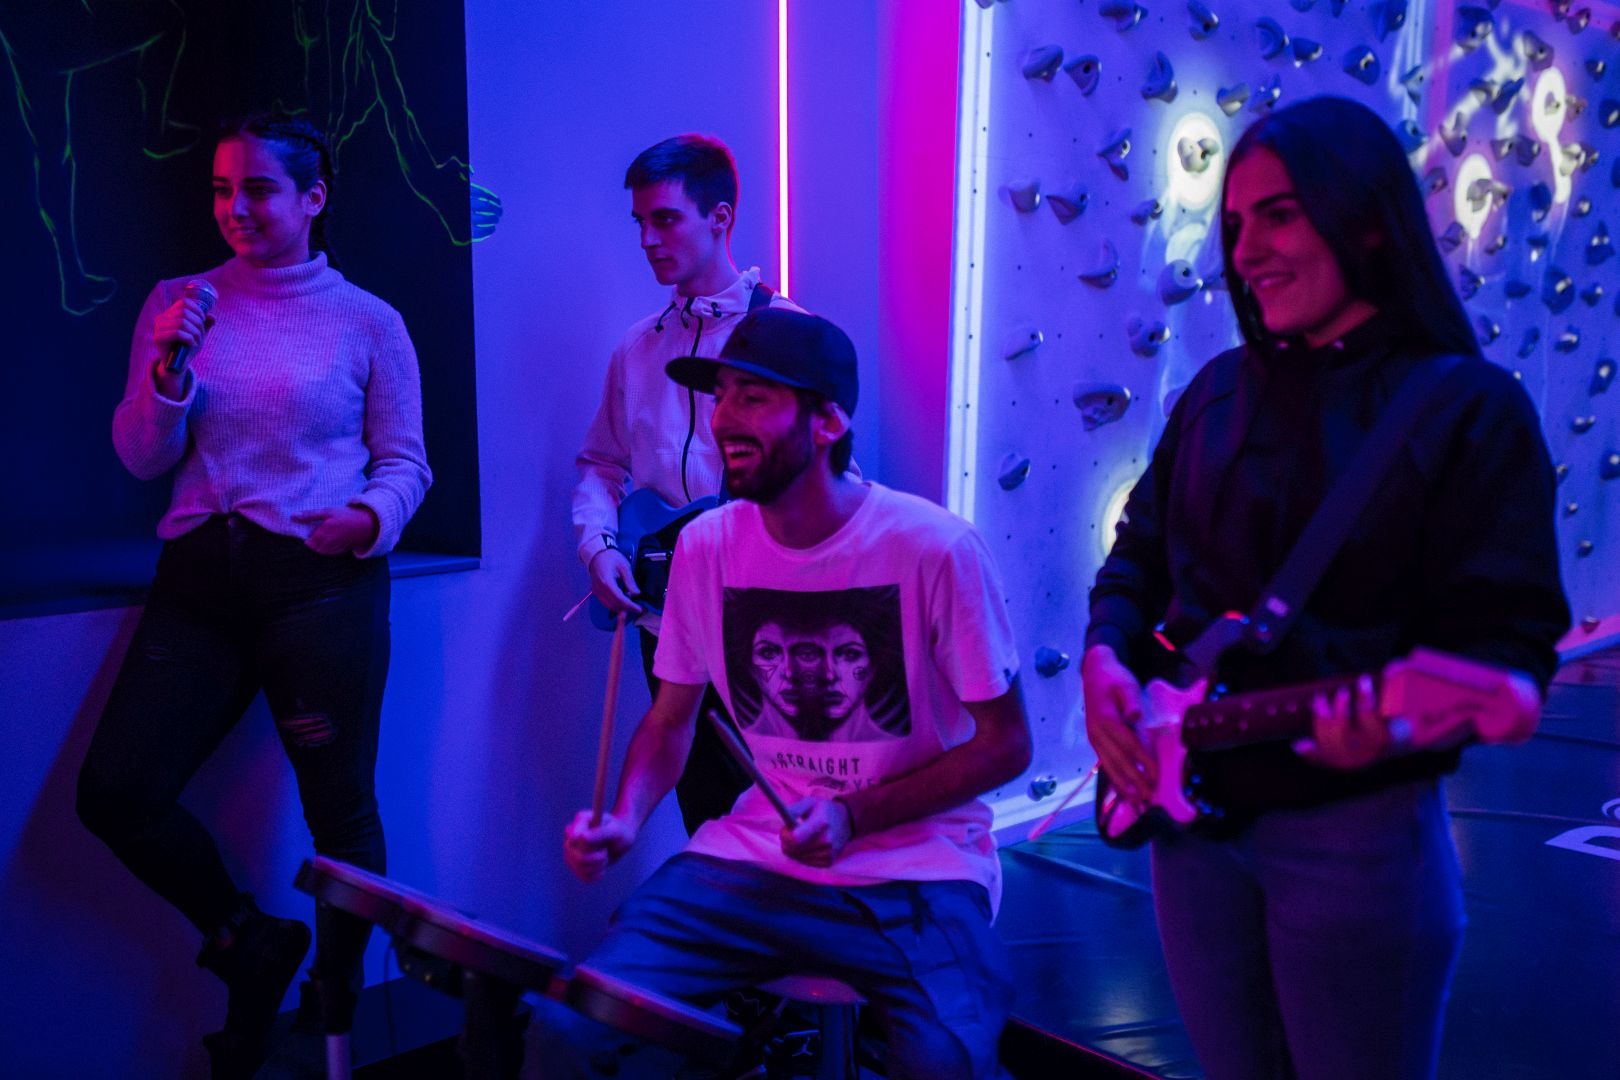 RockBand-instruments-crew-band